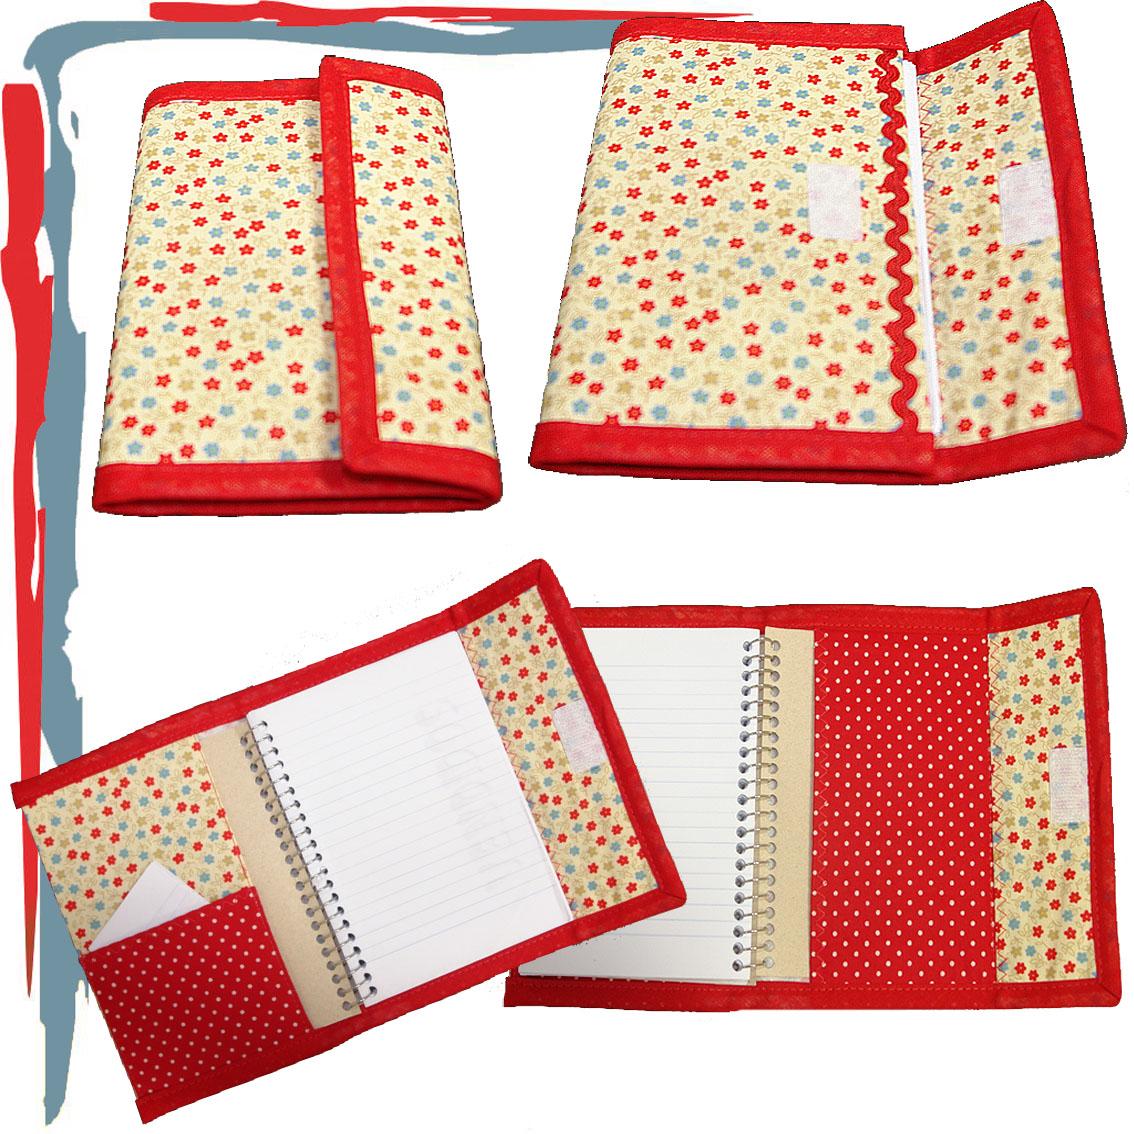 capa caderninho vermelha